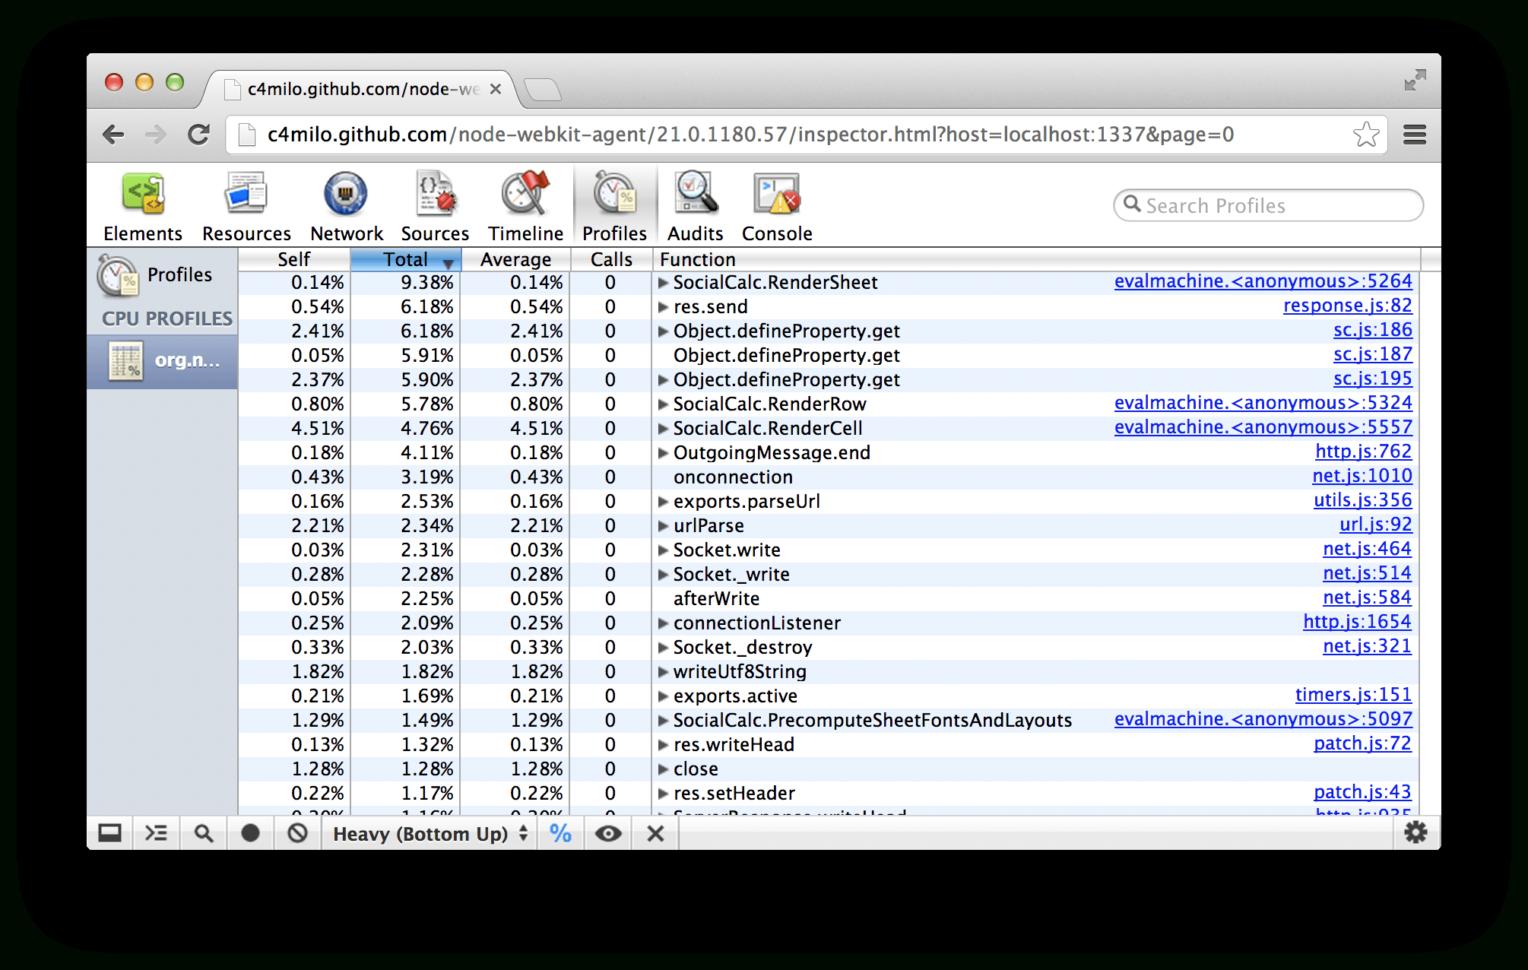 Web Based Spreadsheet Regarding Ethercalc